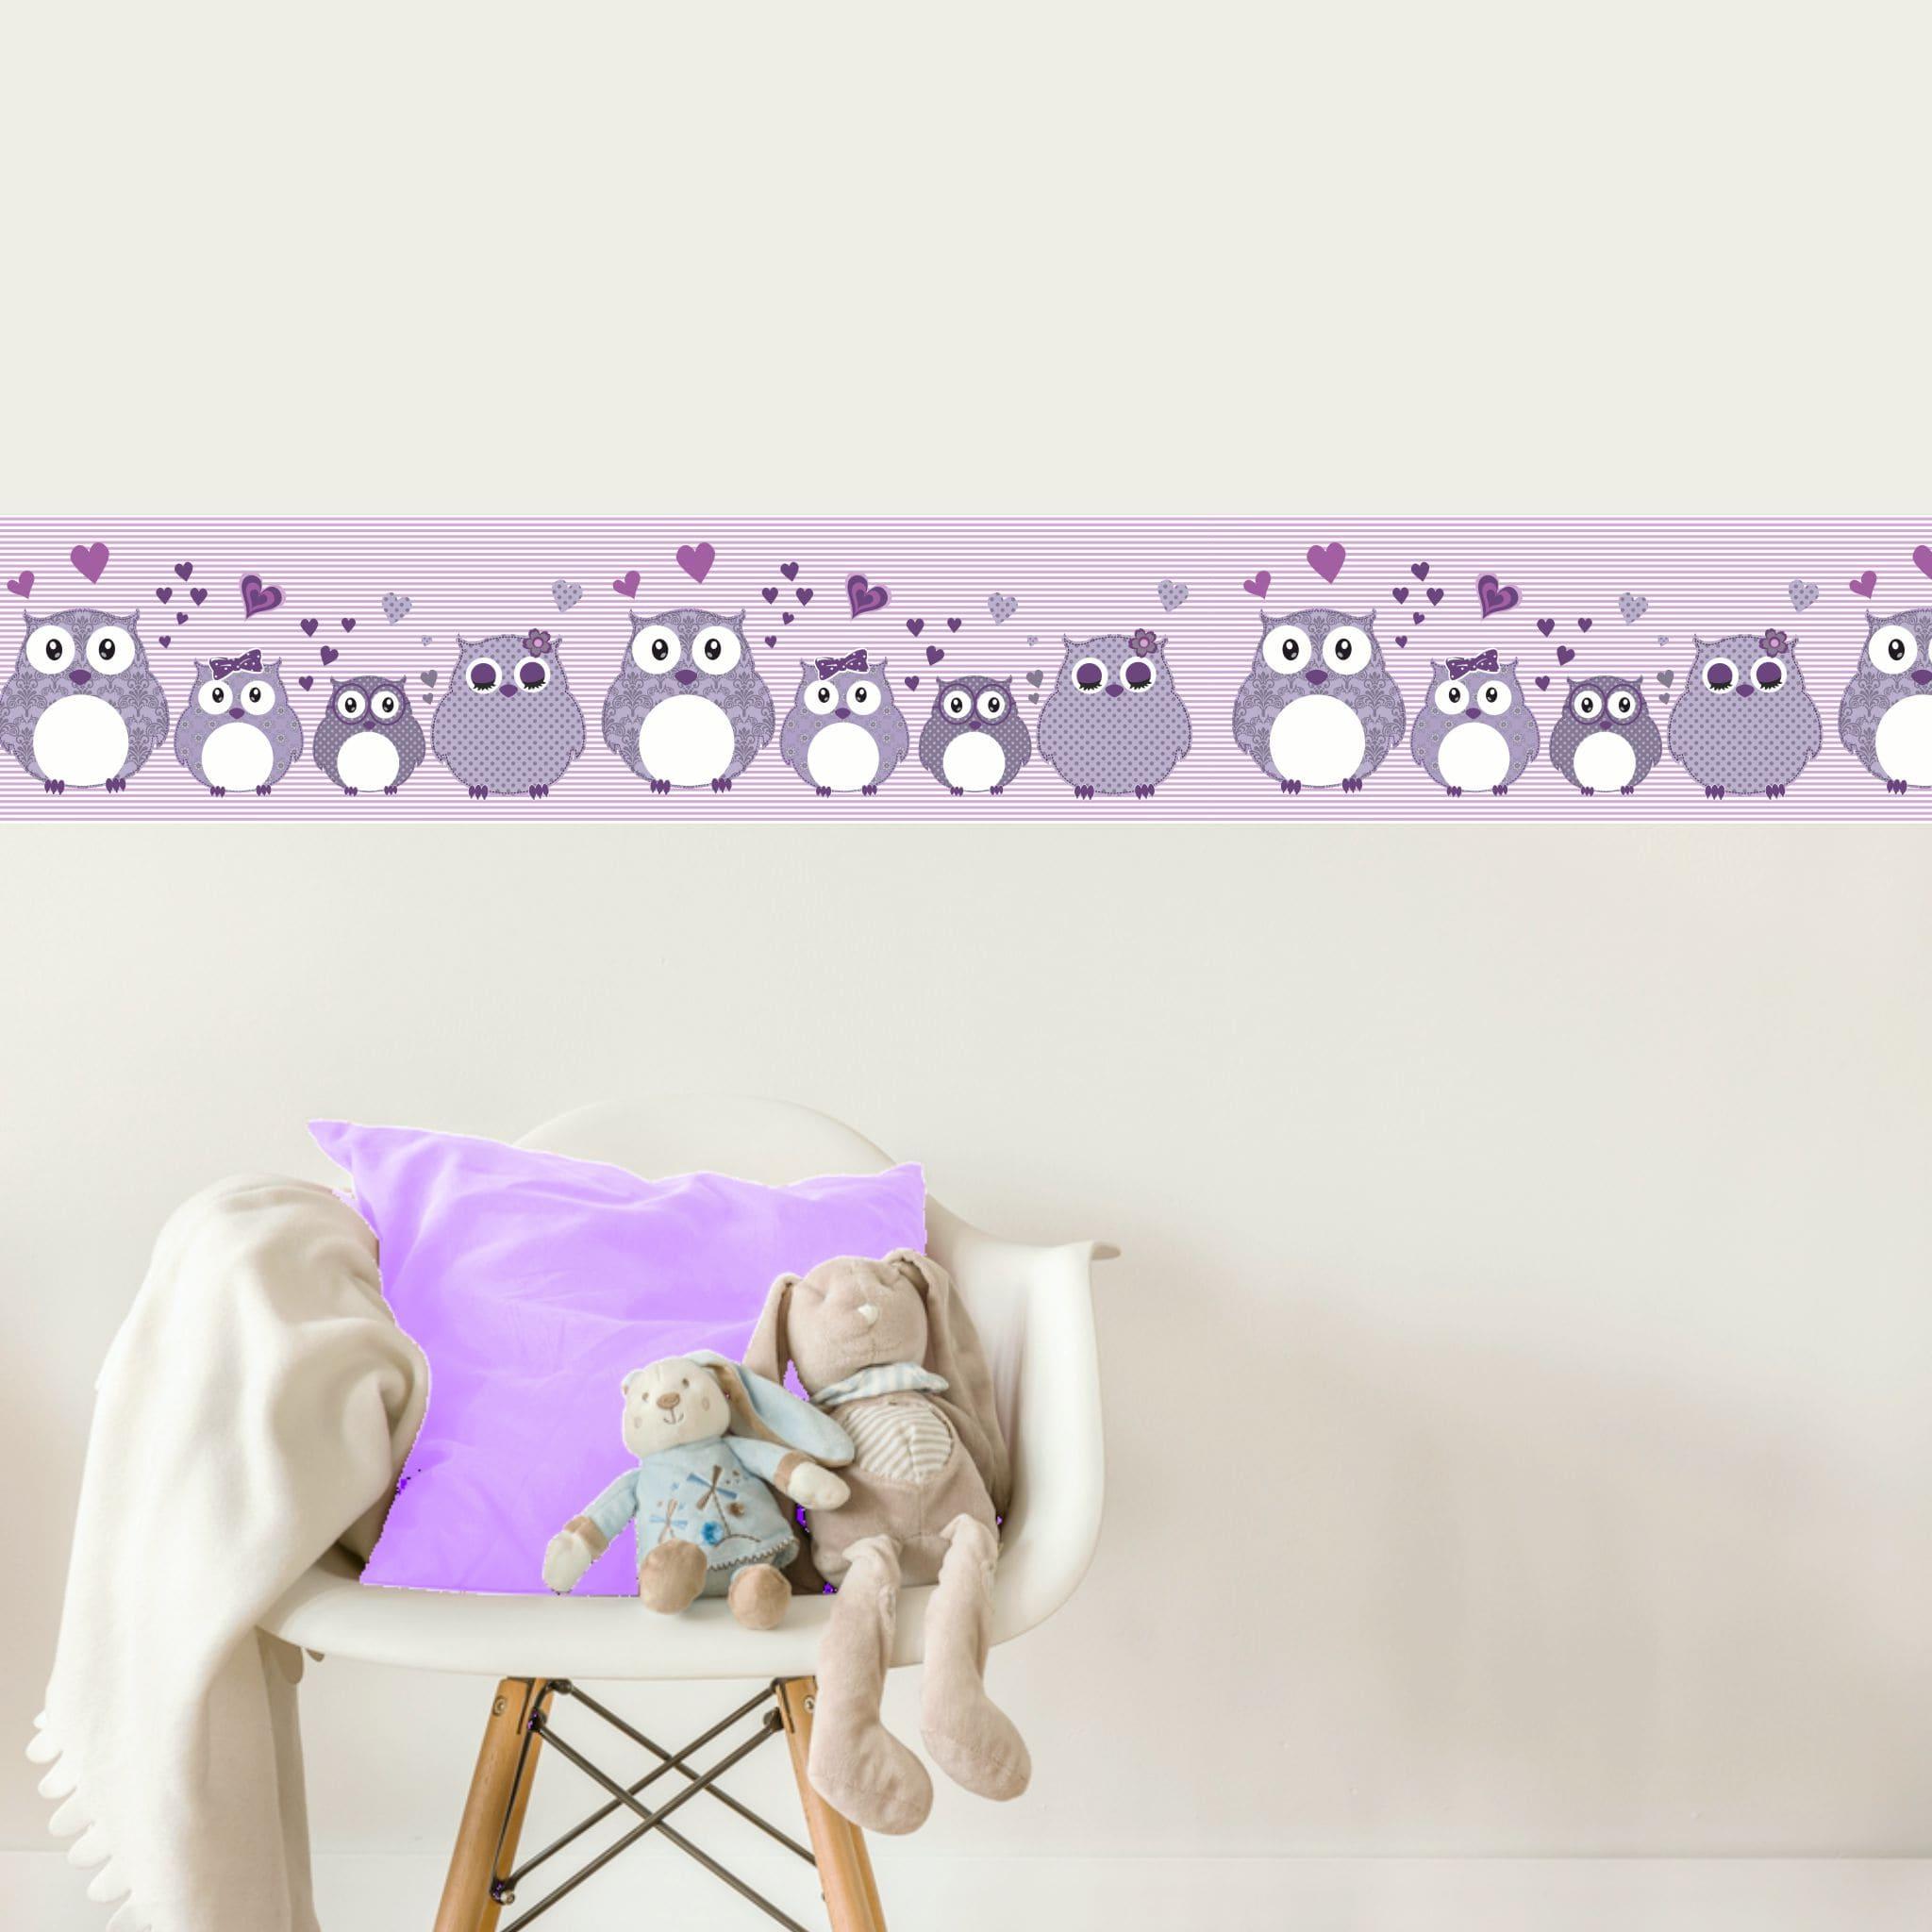 Vlies Bordüre selbstklebend fürs Kinderzimmer Patchwork lila